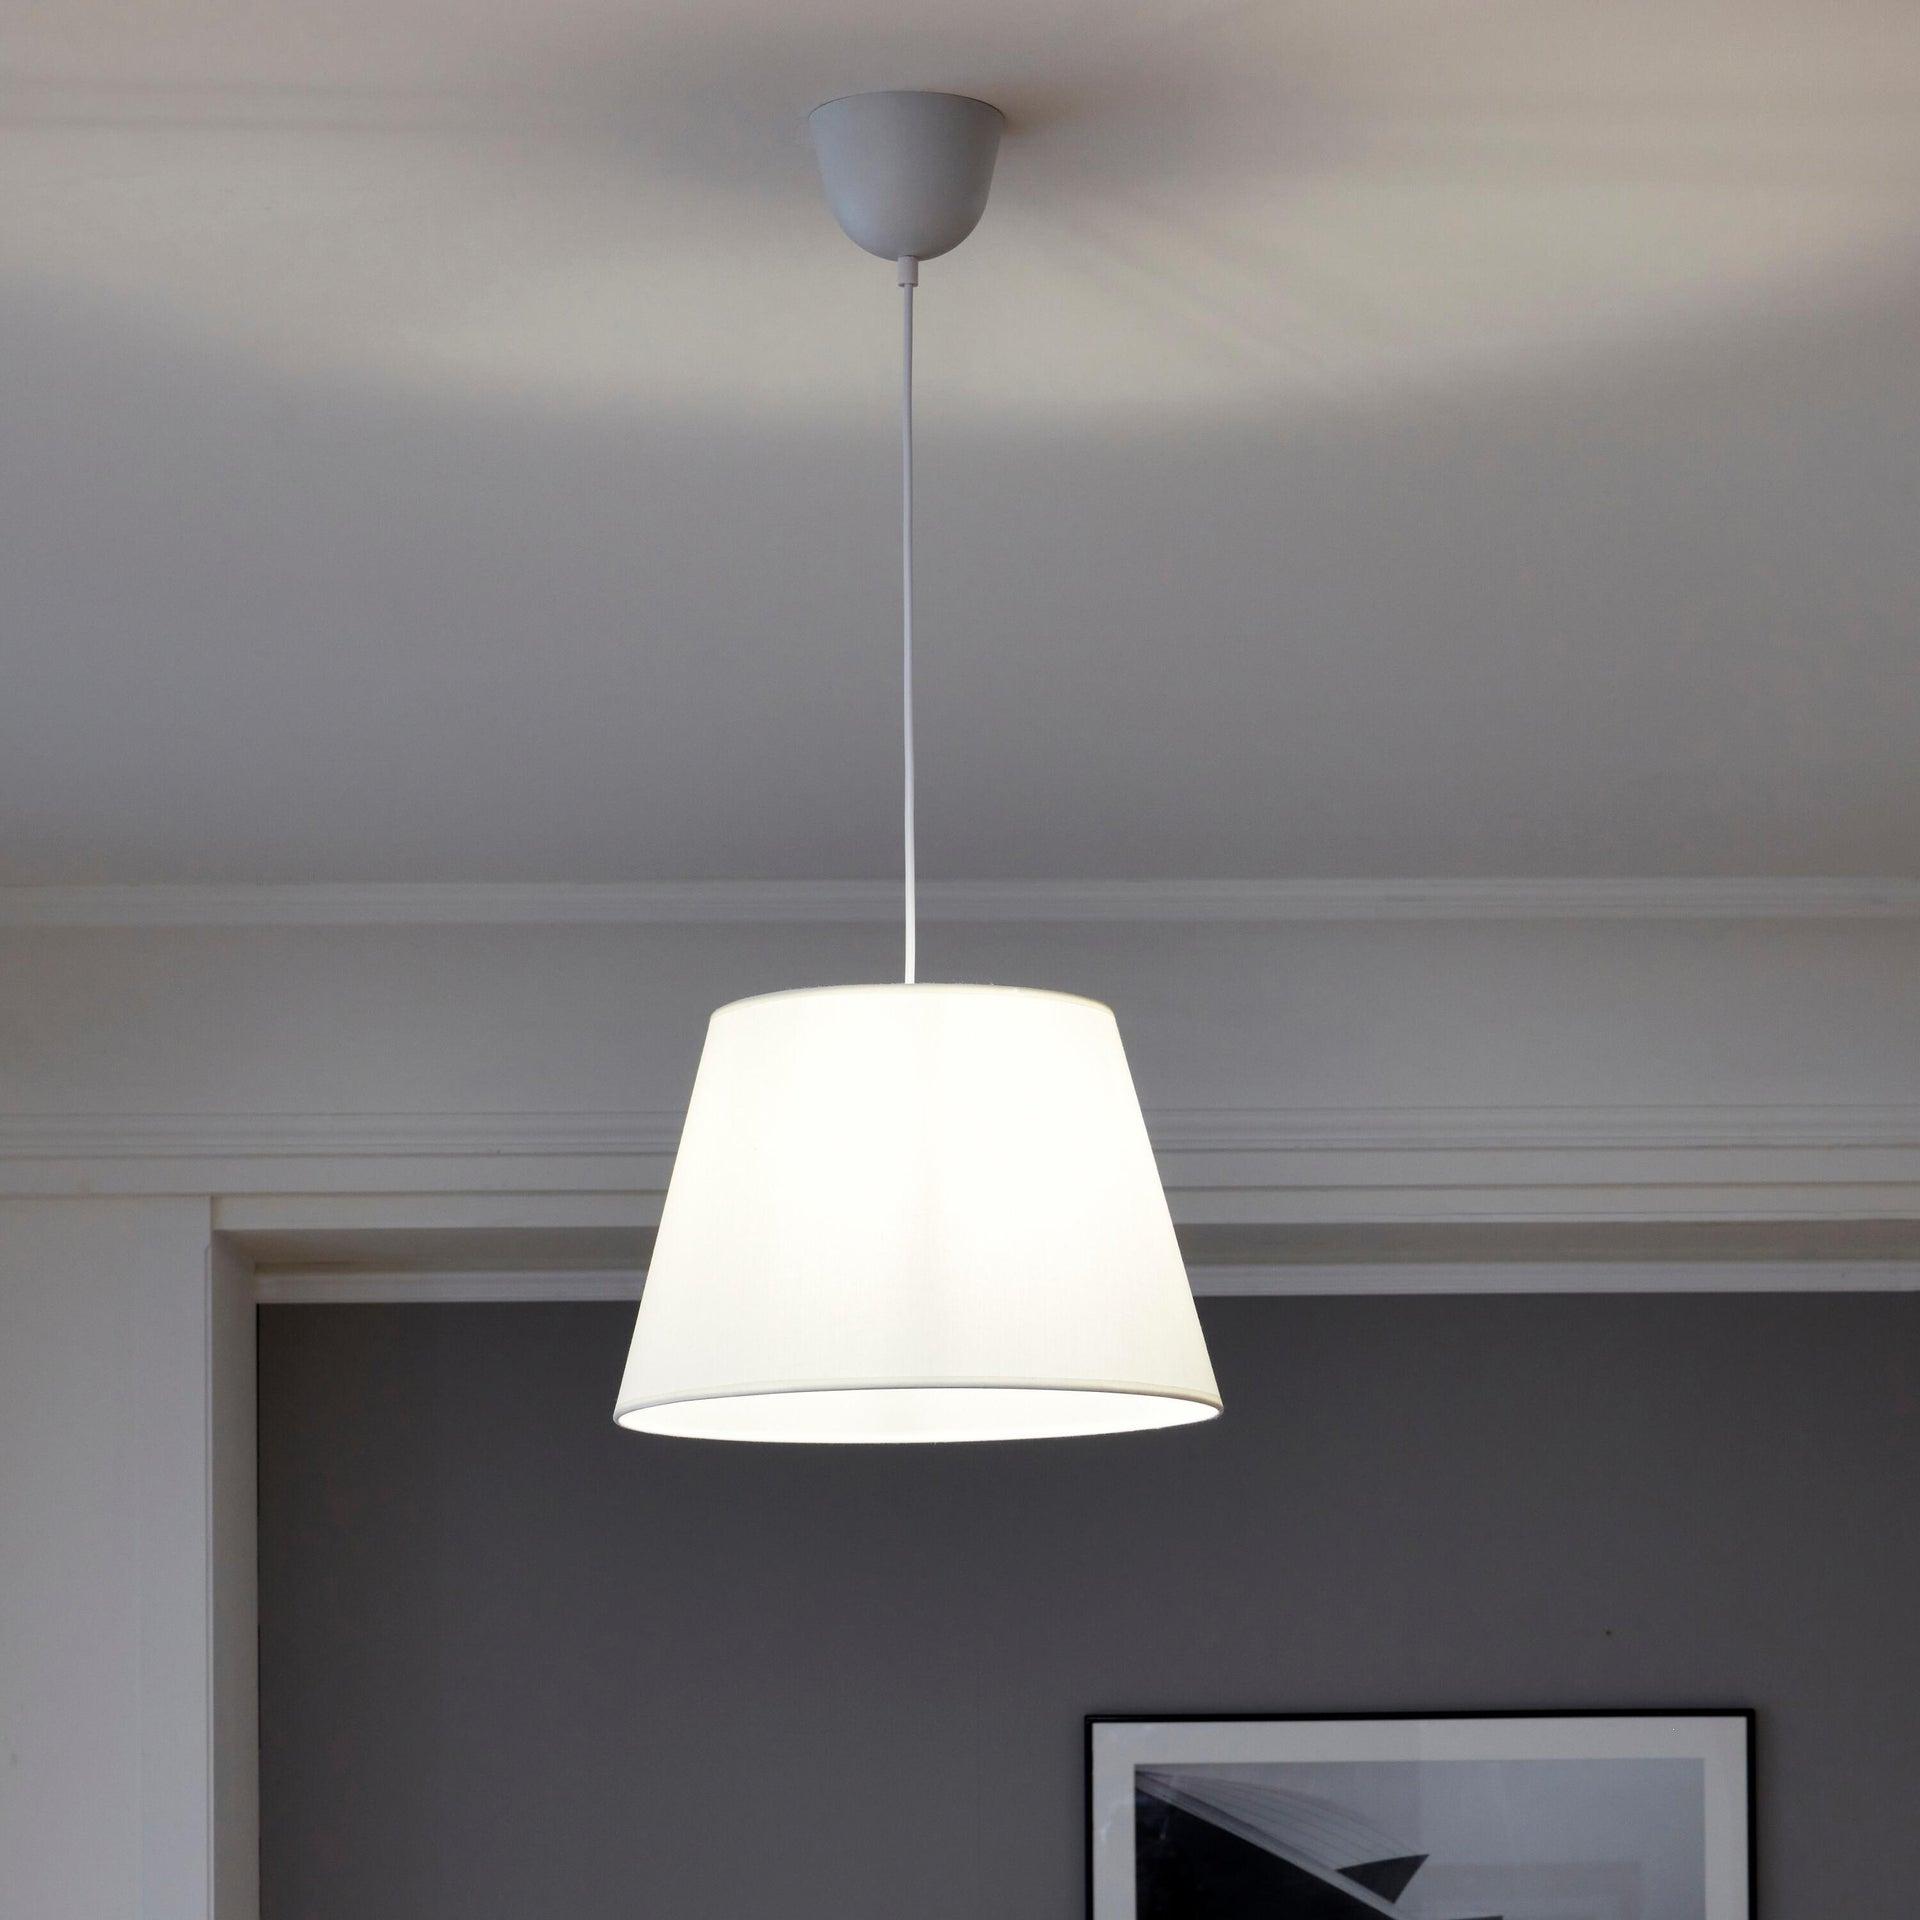 Lampadario Moderno Sitia bianco in tessuto, D. 38 cm, L. 25 cm, INSPIRE - 3